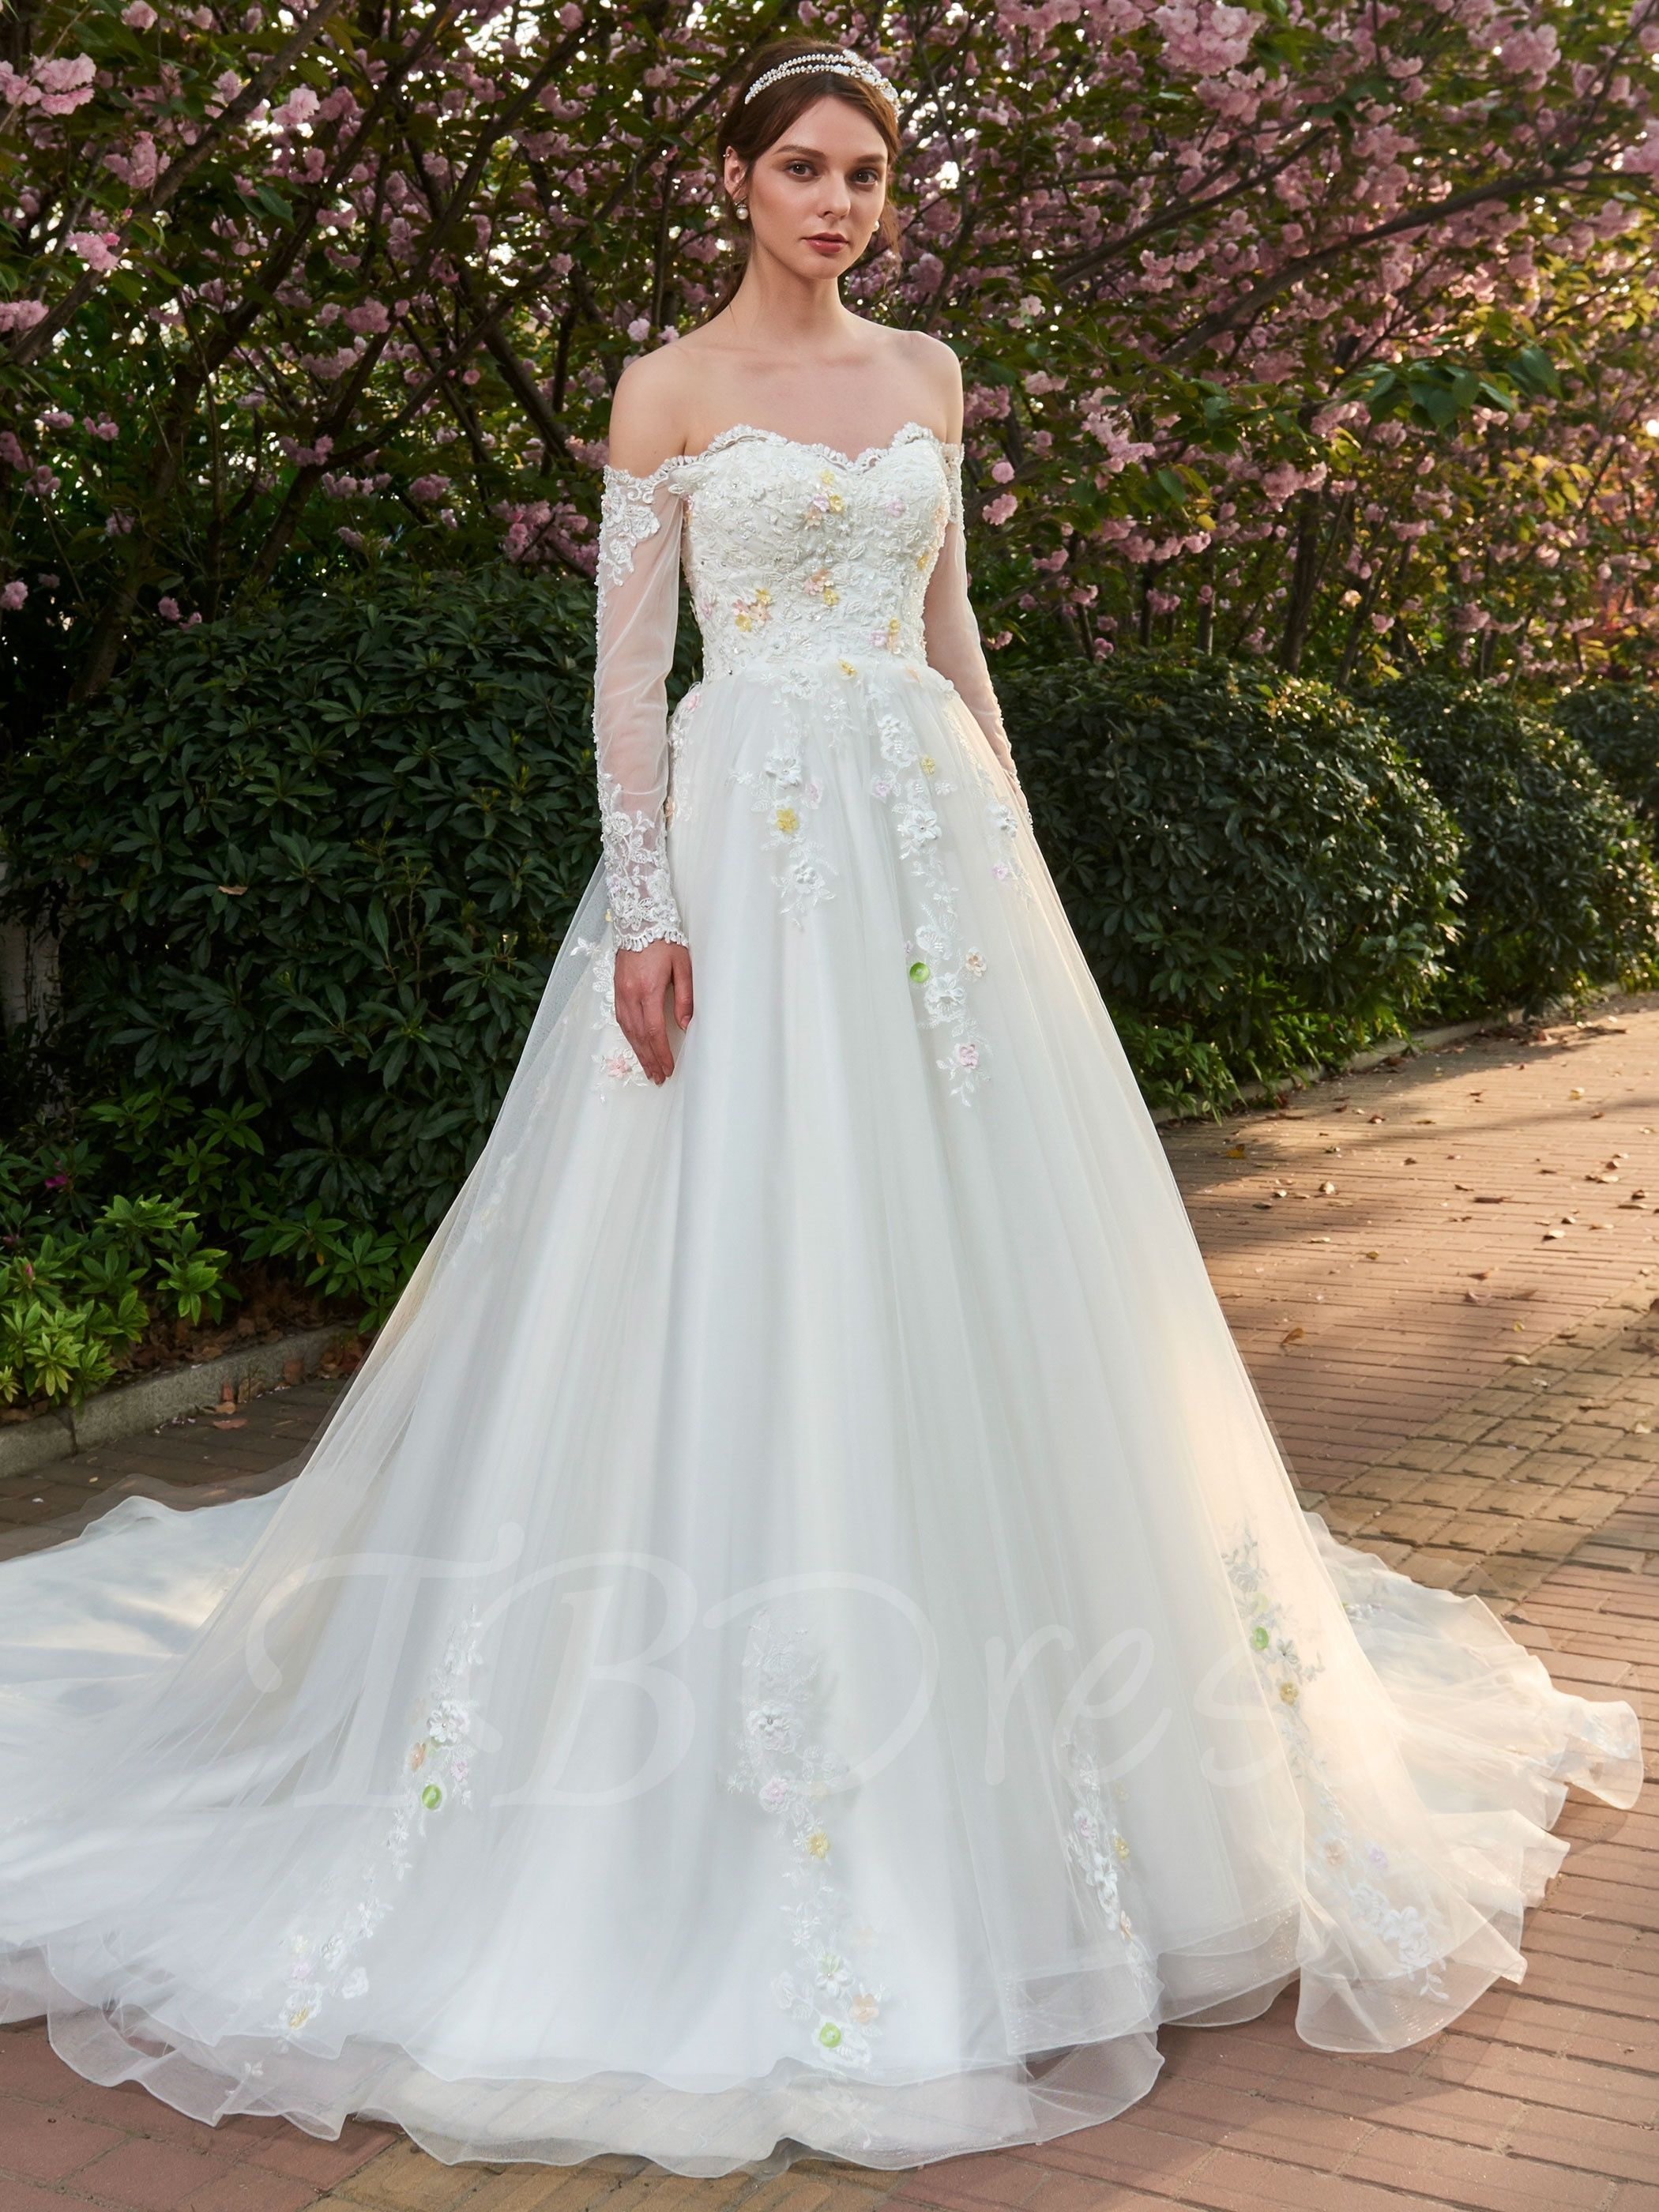 Beading 3d Floral Appliques Off Shoulder Wedding Dress With Long Sleeves Off Shoulder Wedding Dress Dresses Wedding Dresses [ 2800 x 2100 Pixel ]